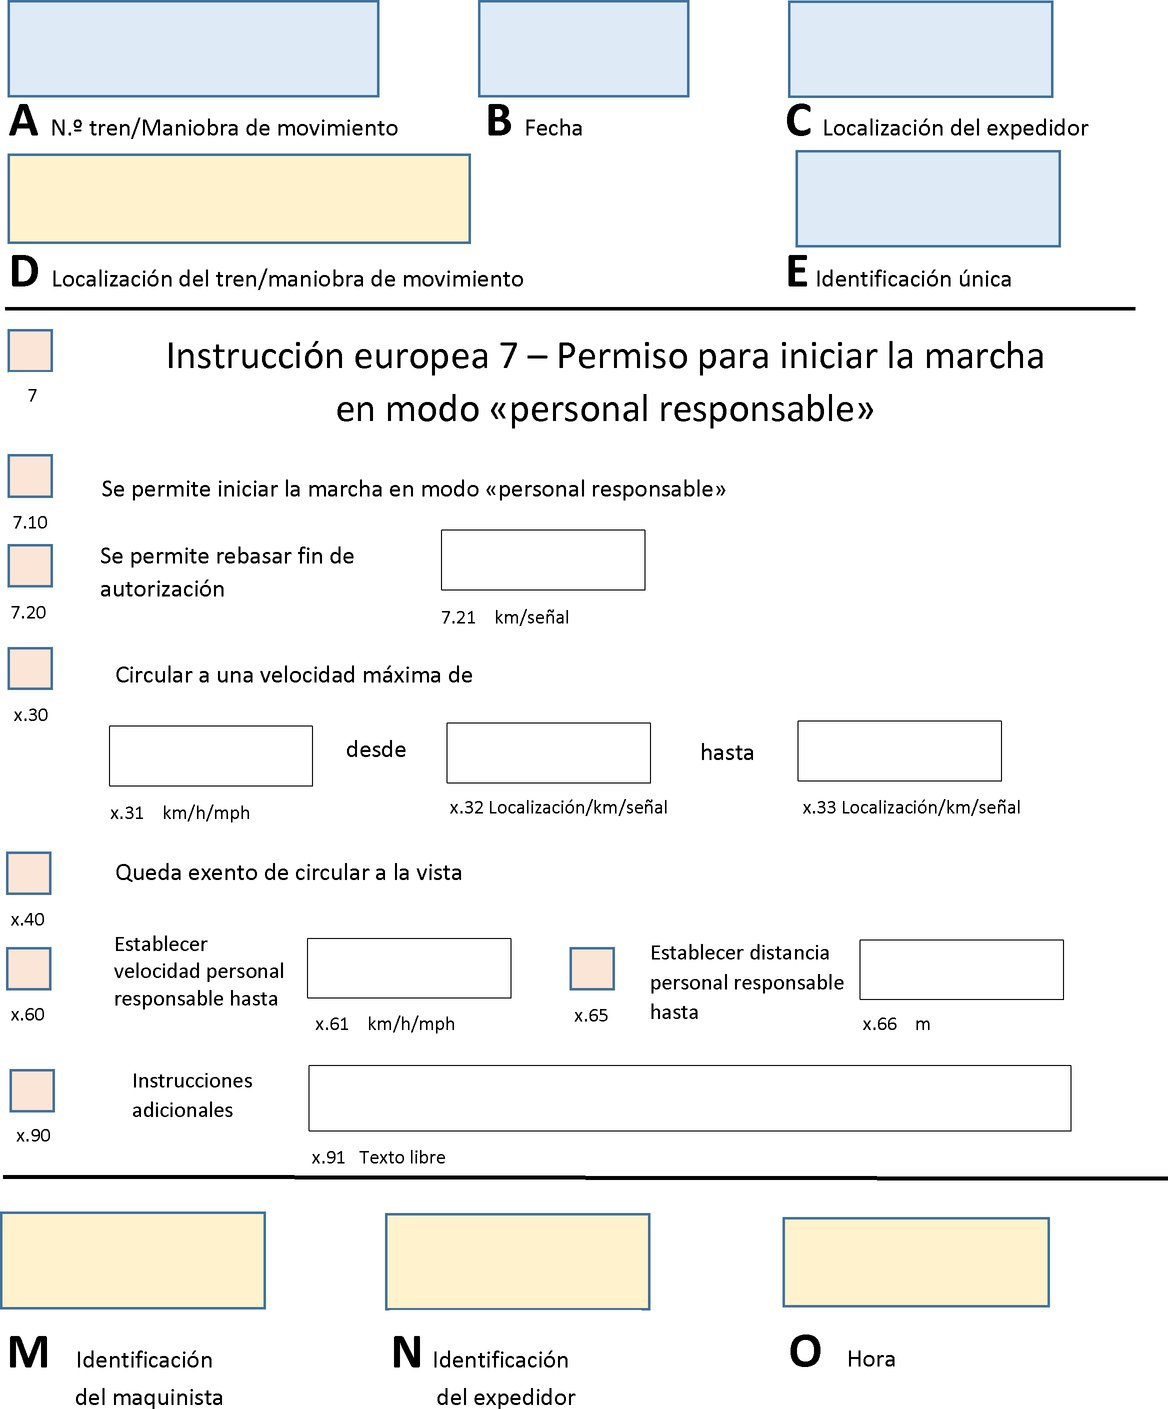 Imagen: https://eur-lex.europa.eu/resource.html?uri=uriserv:OJ.LI.2019.139.01.0005.01.SPA.xhtml.LI2019139ES.01005901.tif.jpg